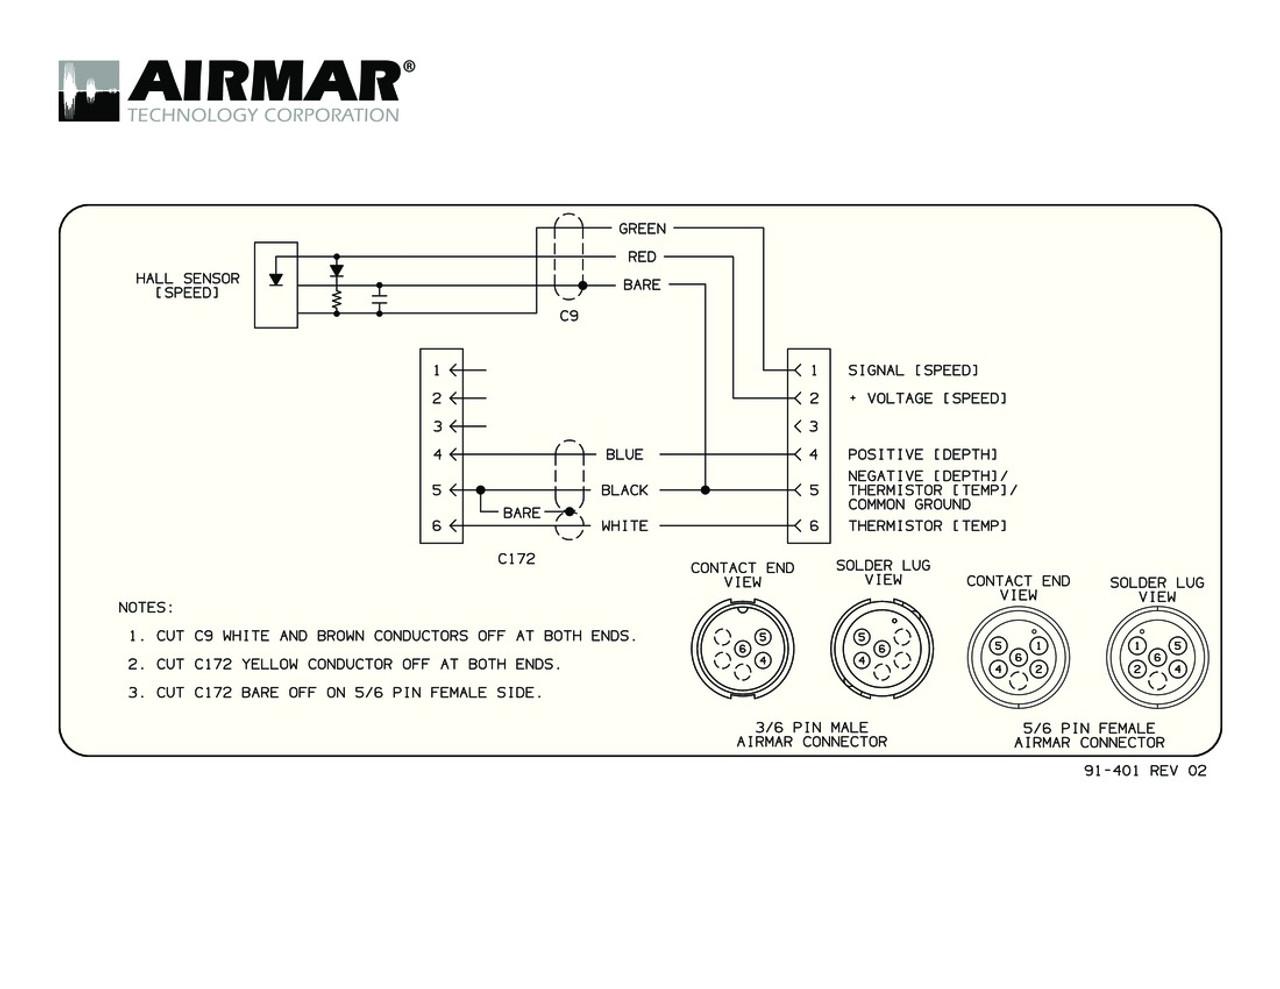 Airmar Wiring Diagram Garmin 6 Pin  S